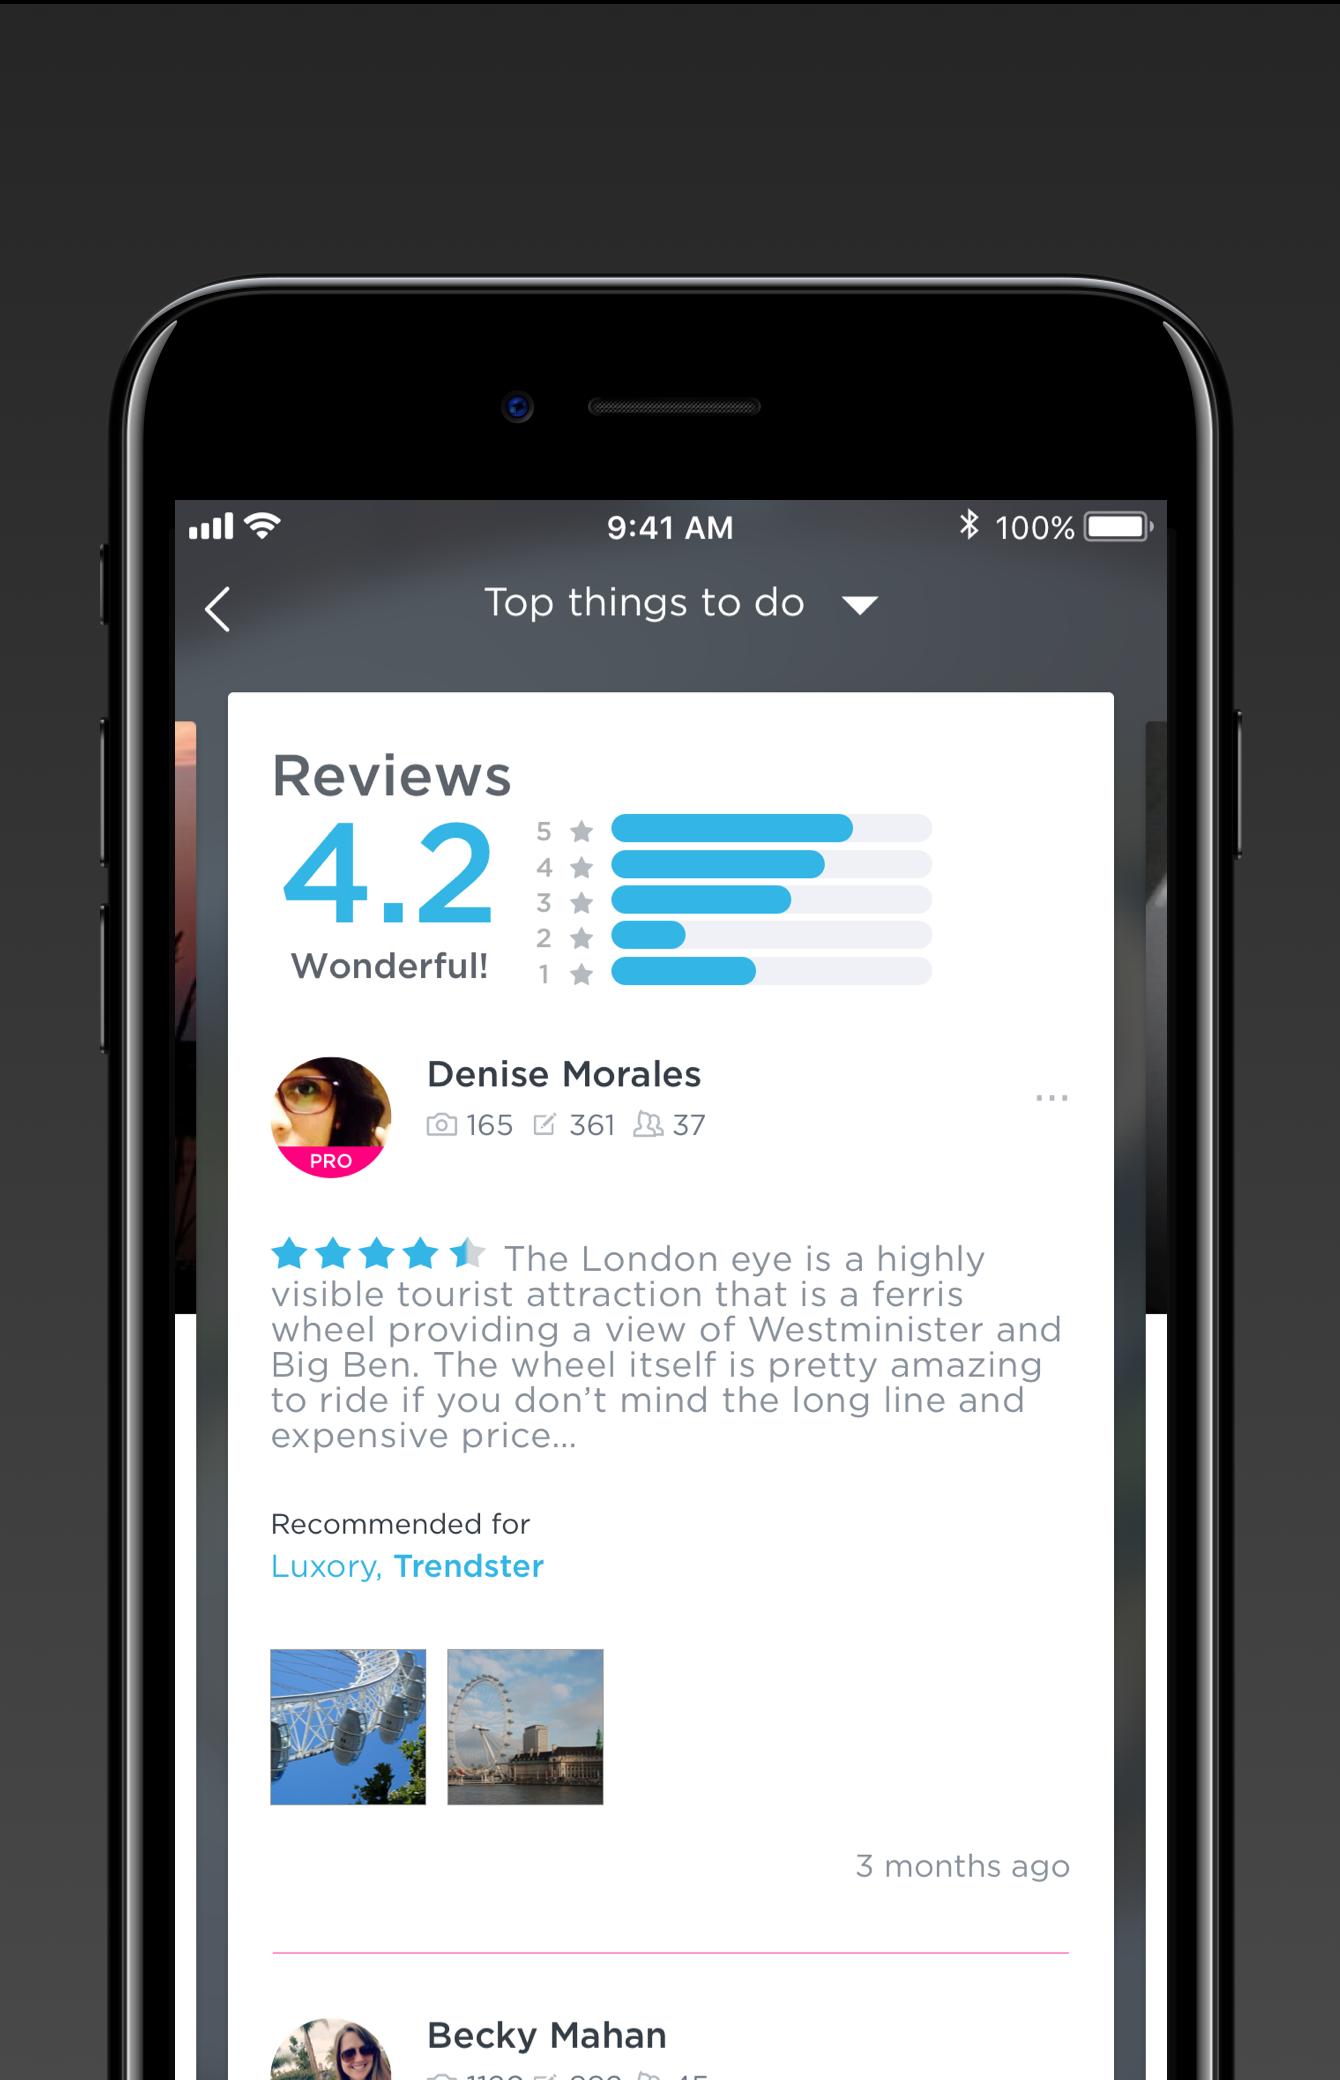 A3_TopicPage_LondonEye_Reviews.png